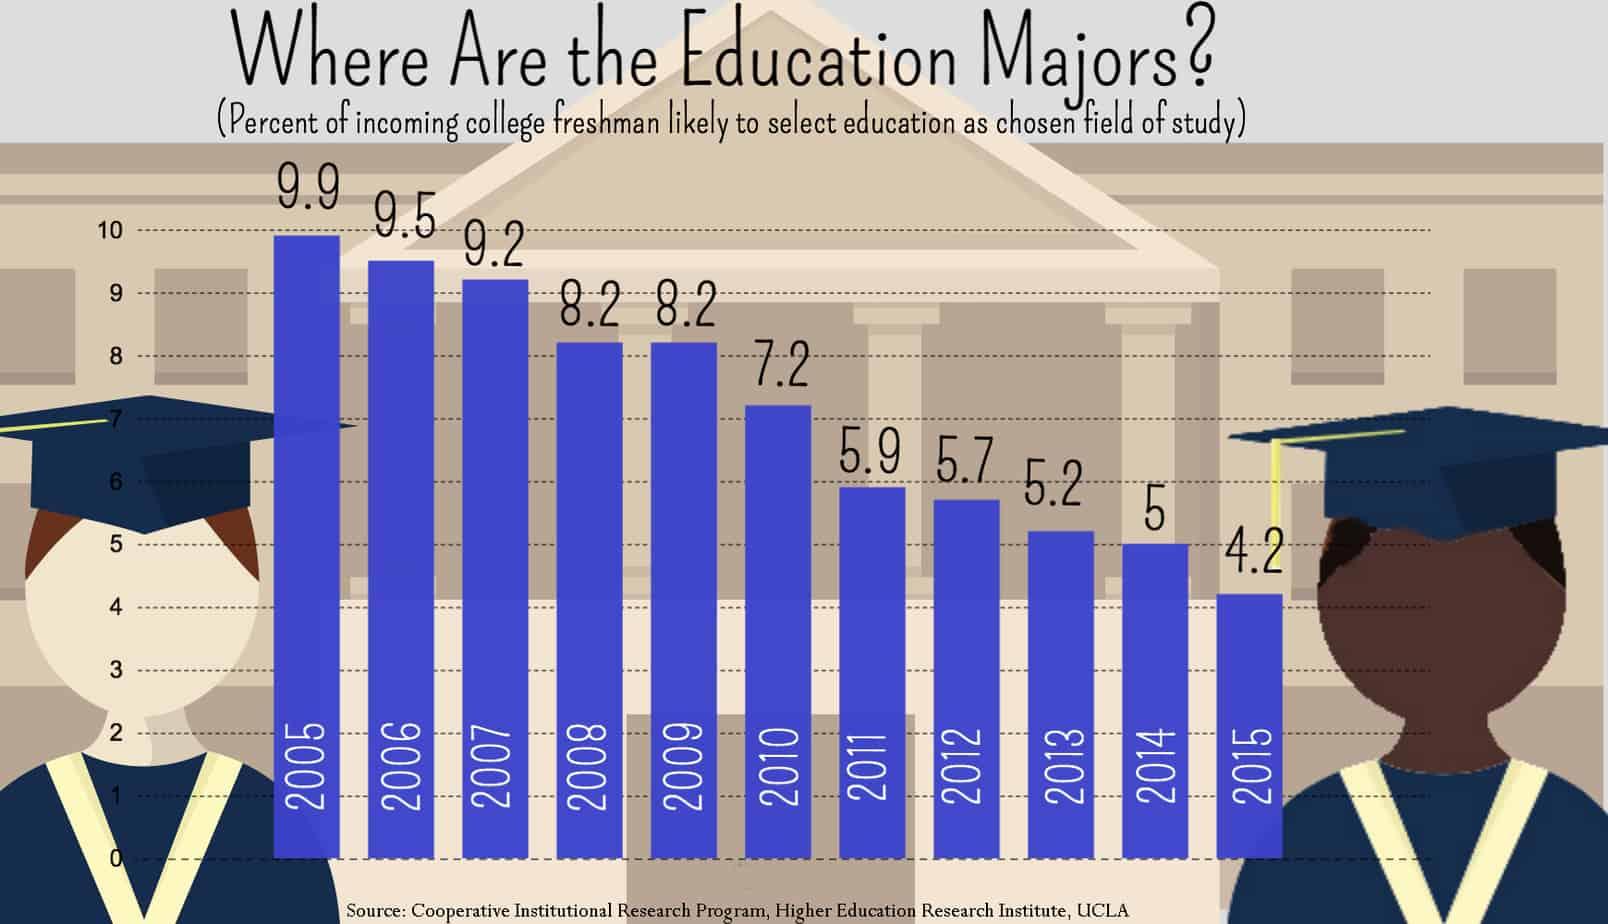 Education Majors Data